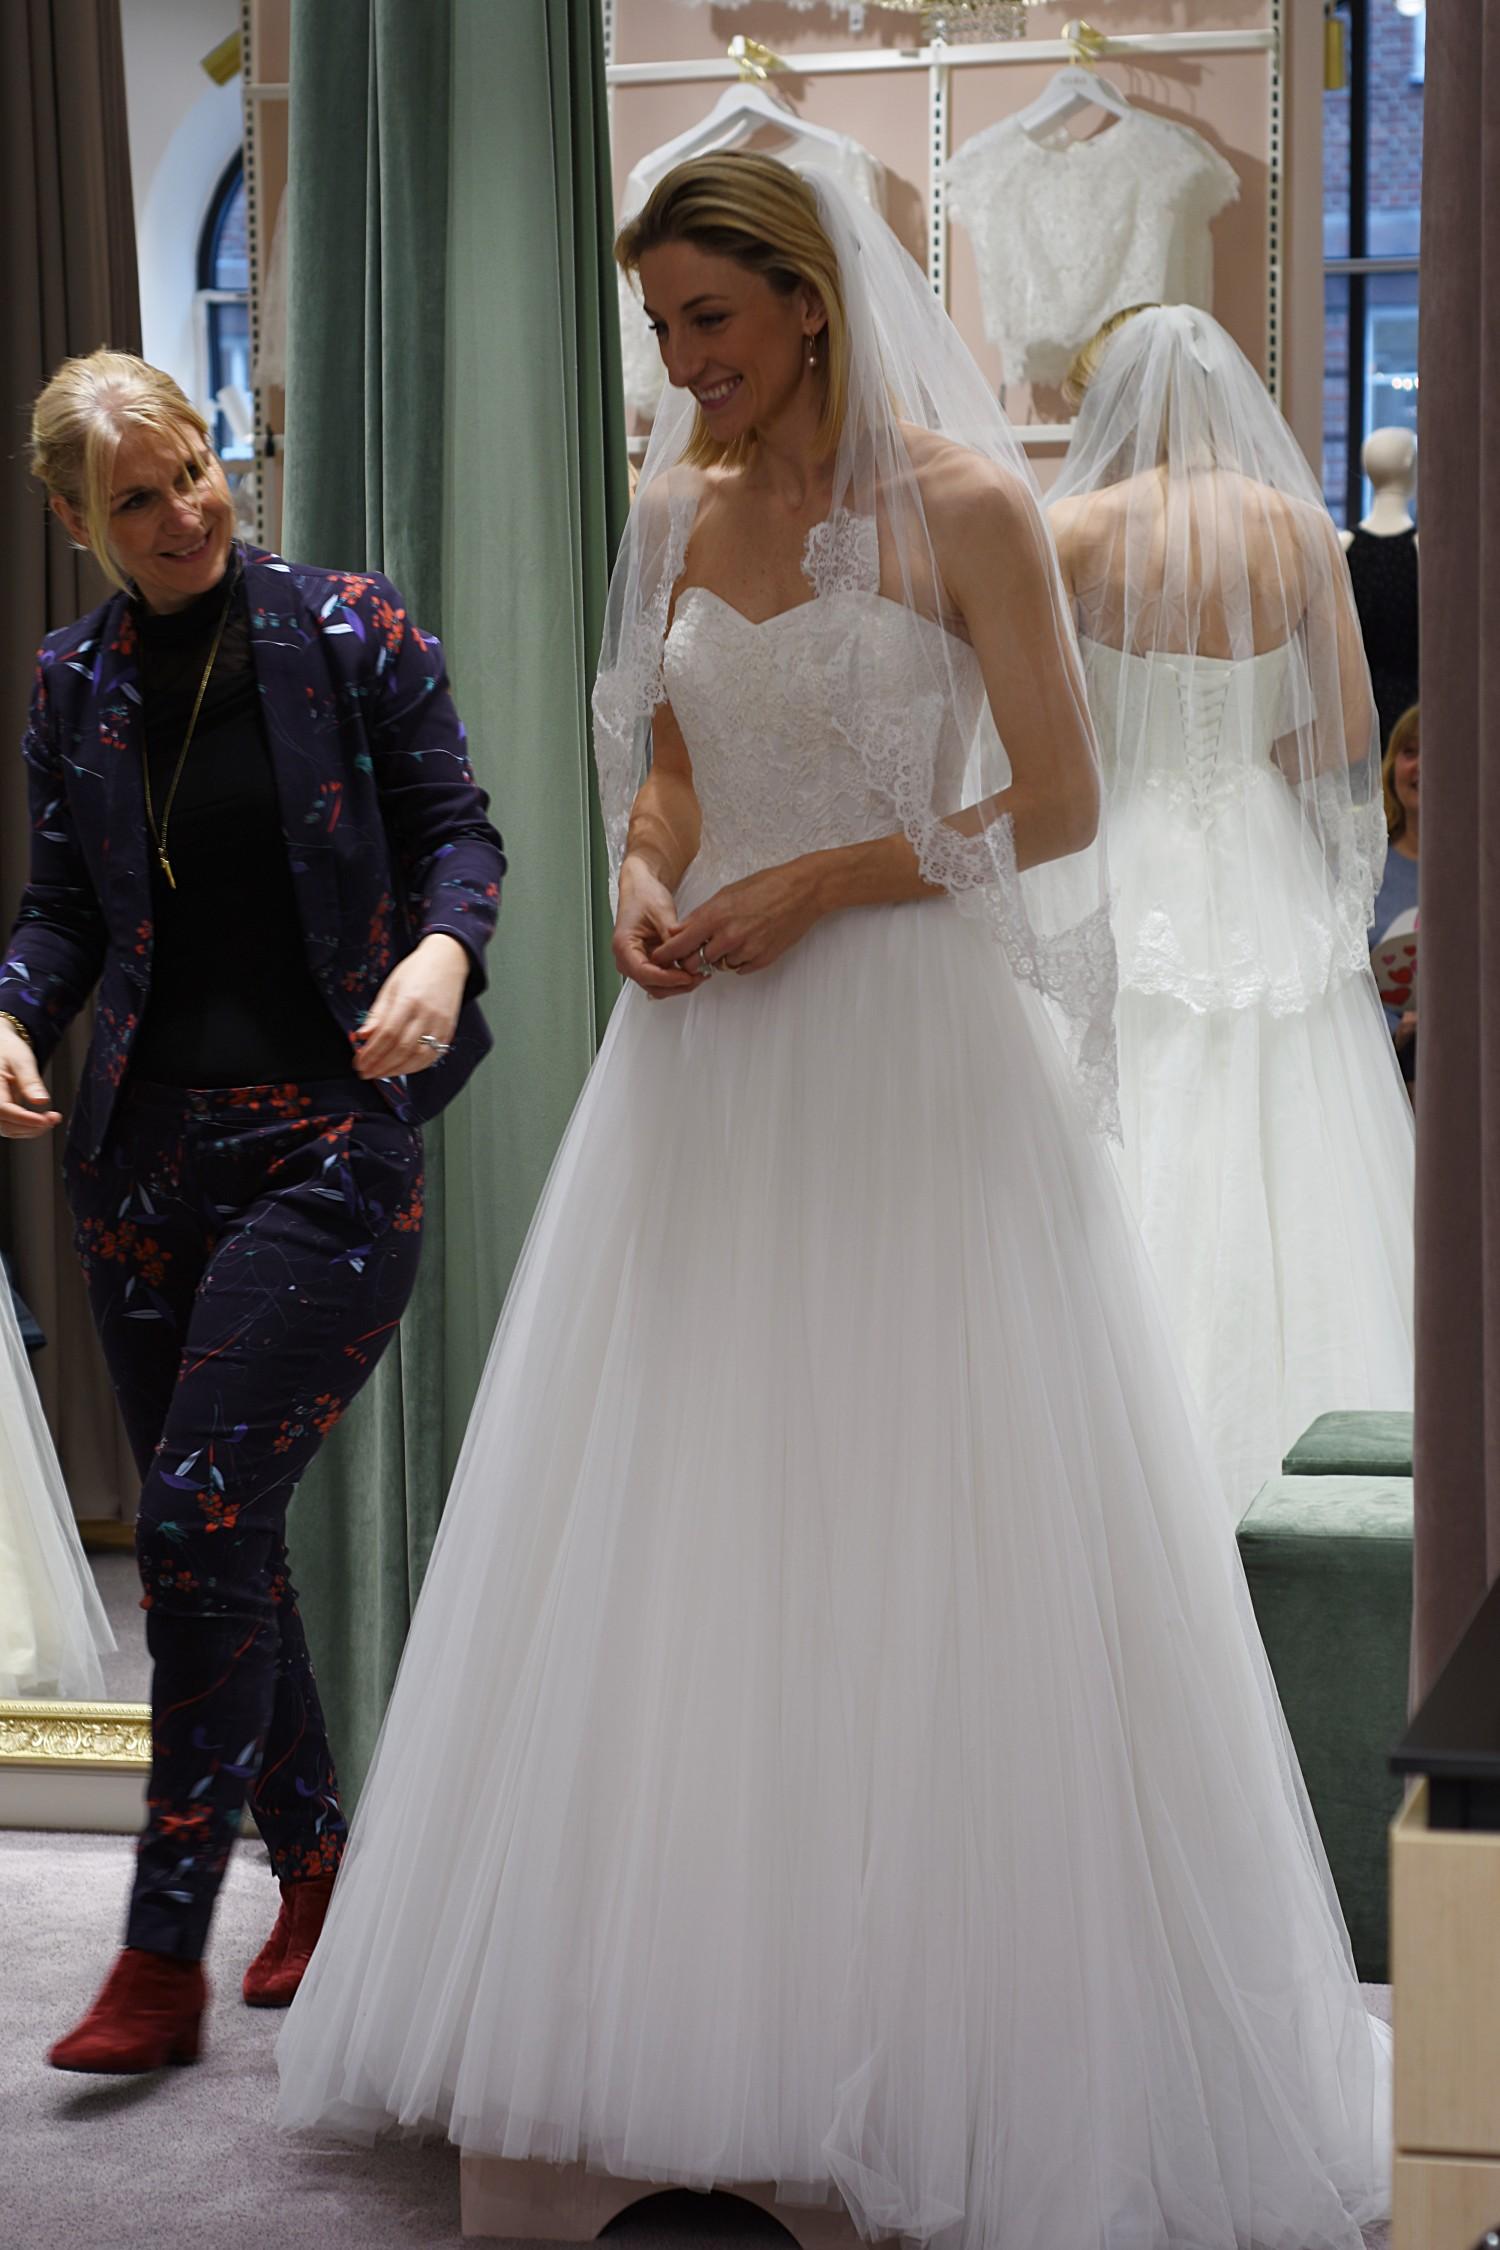 lilly-brudekjoler-annemette-voss-24